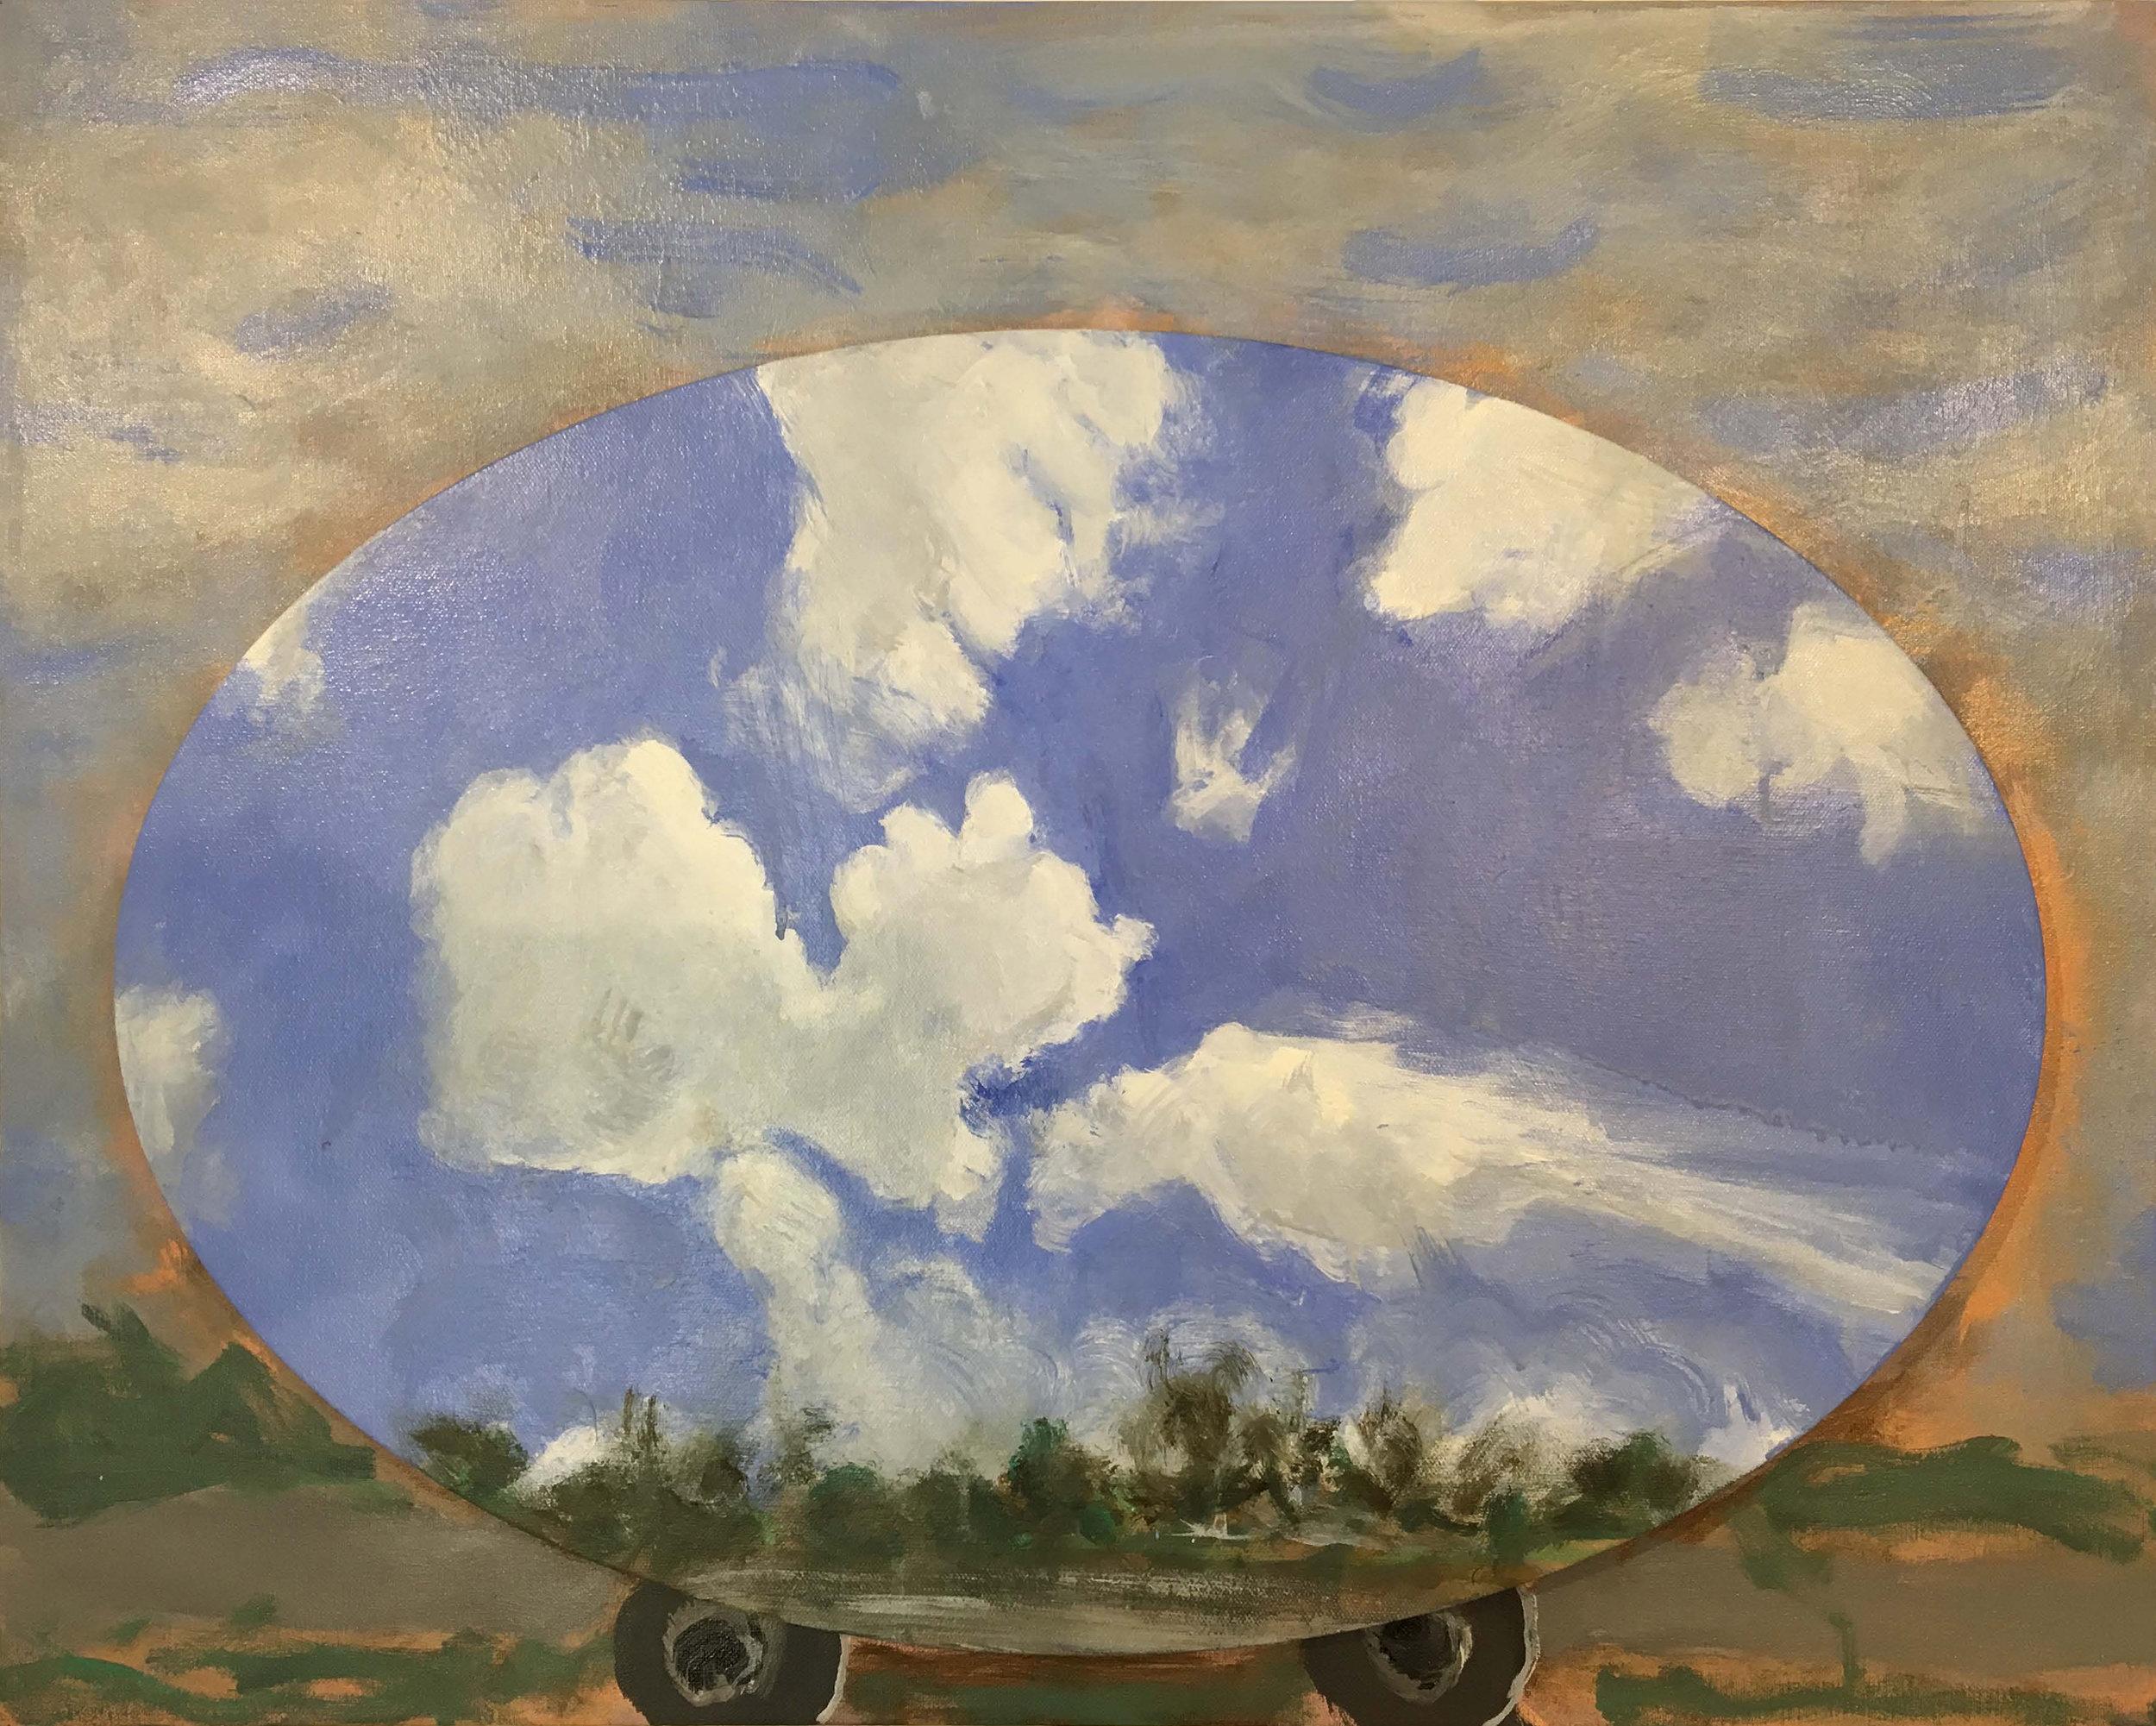 Cloud Comics No.1. 2019.  Acrylic on canvas. 61 x 76 cm. (two panels) $5,500